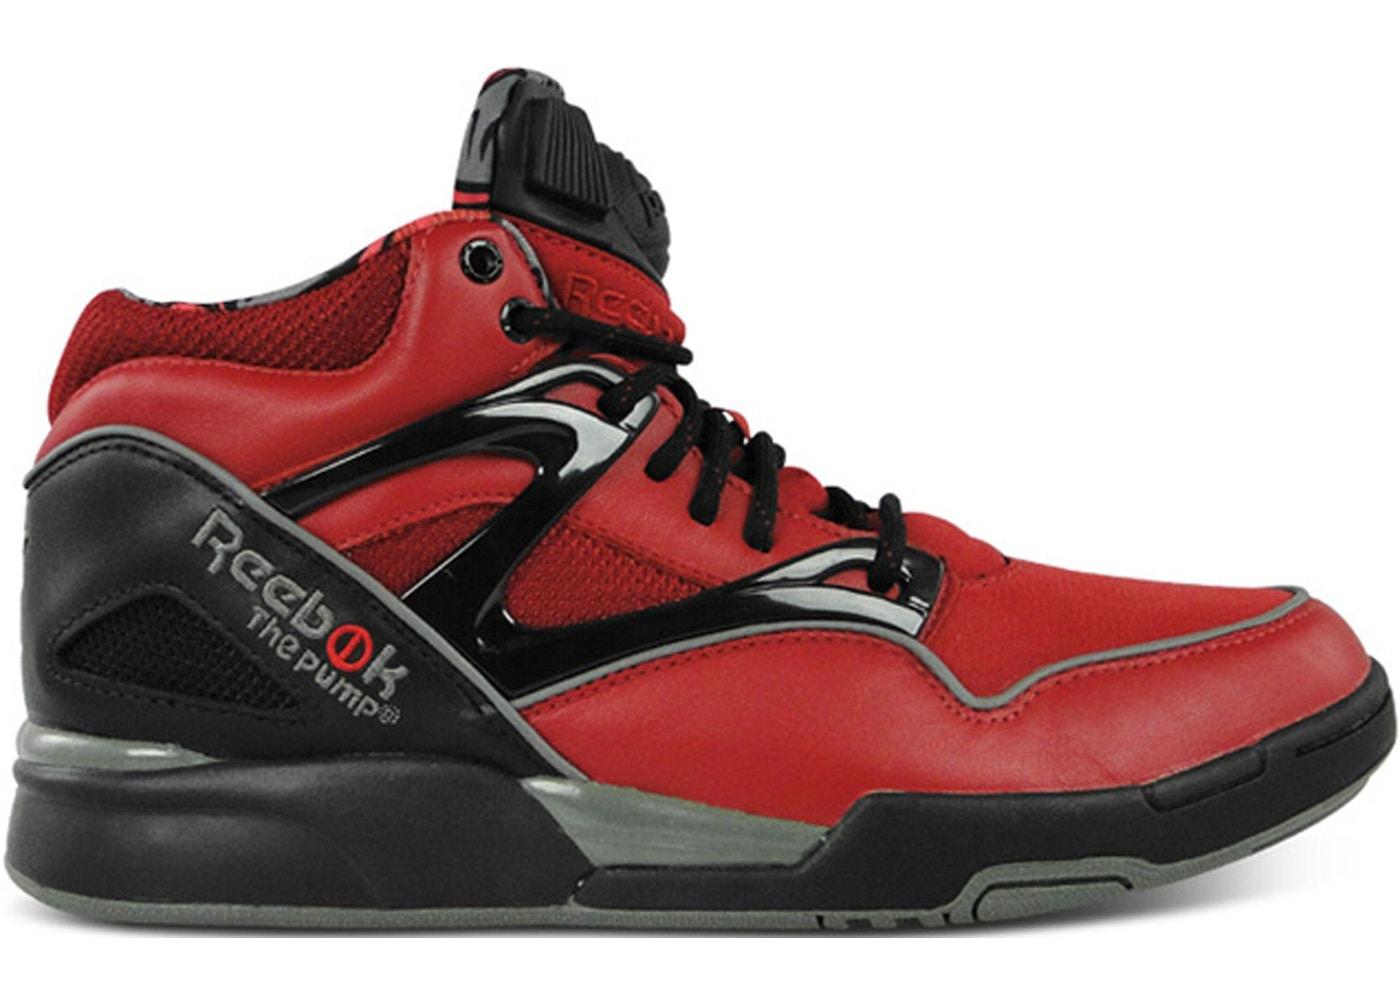 db7d790cc46239 Reebok Size 9 Shoes - New Highest Bids